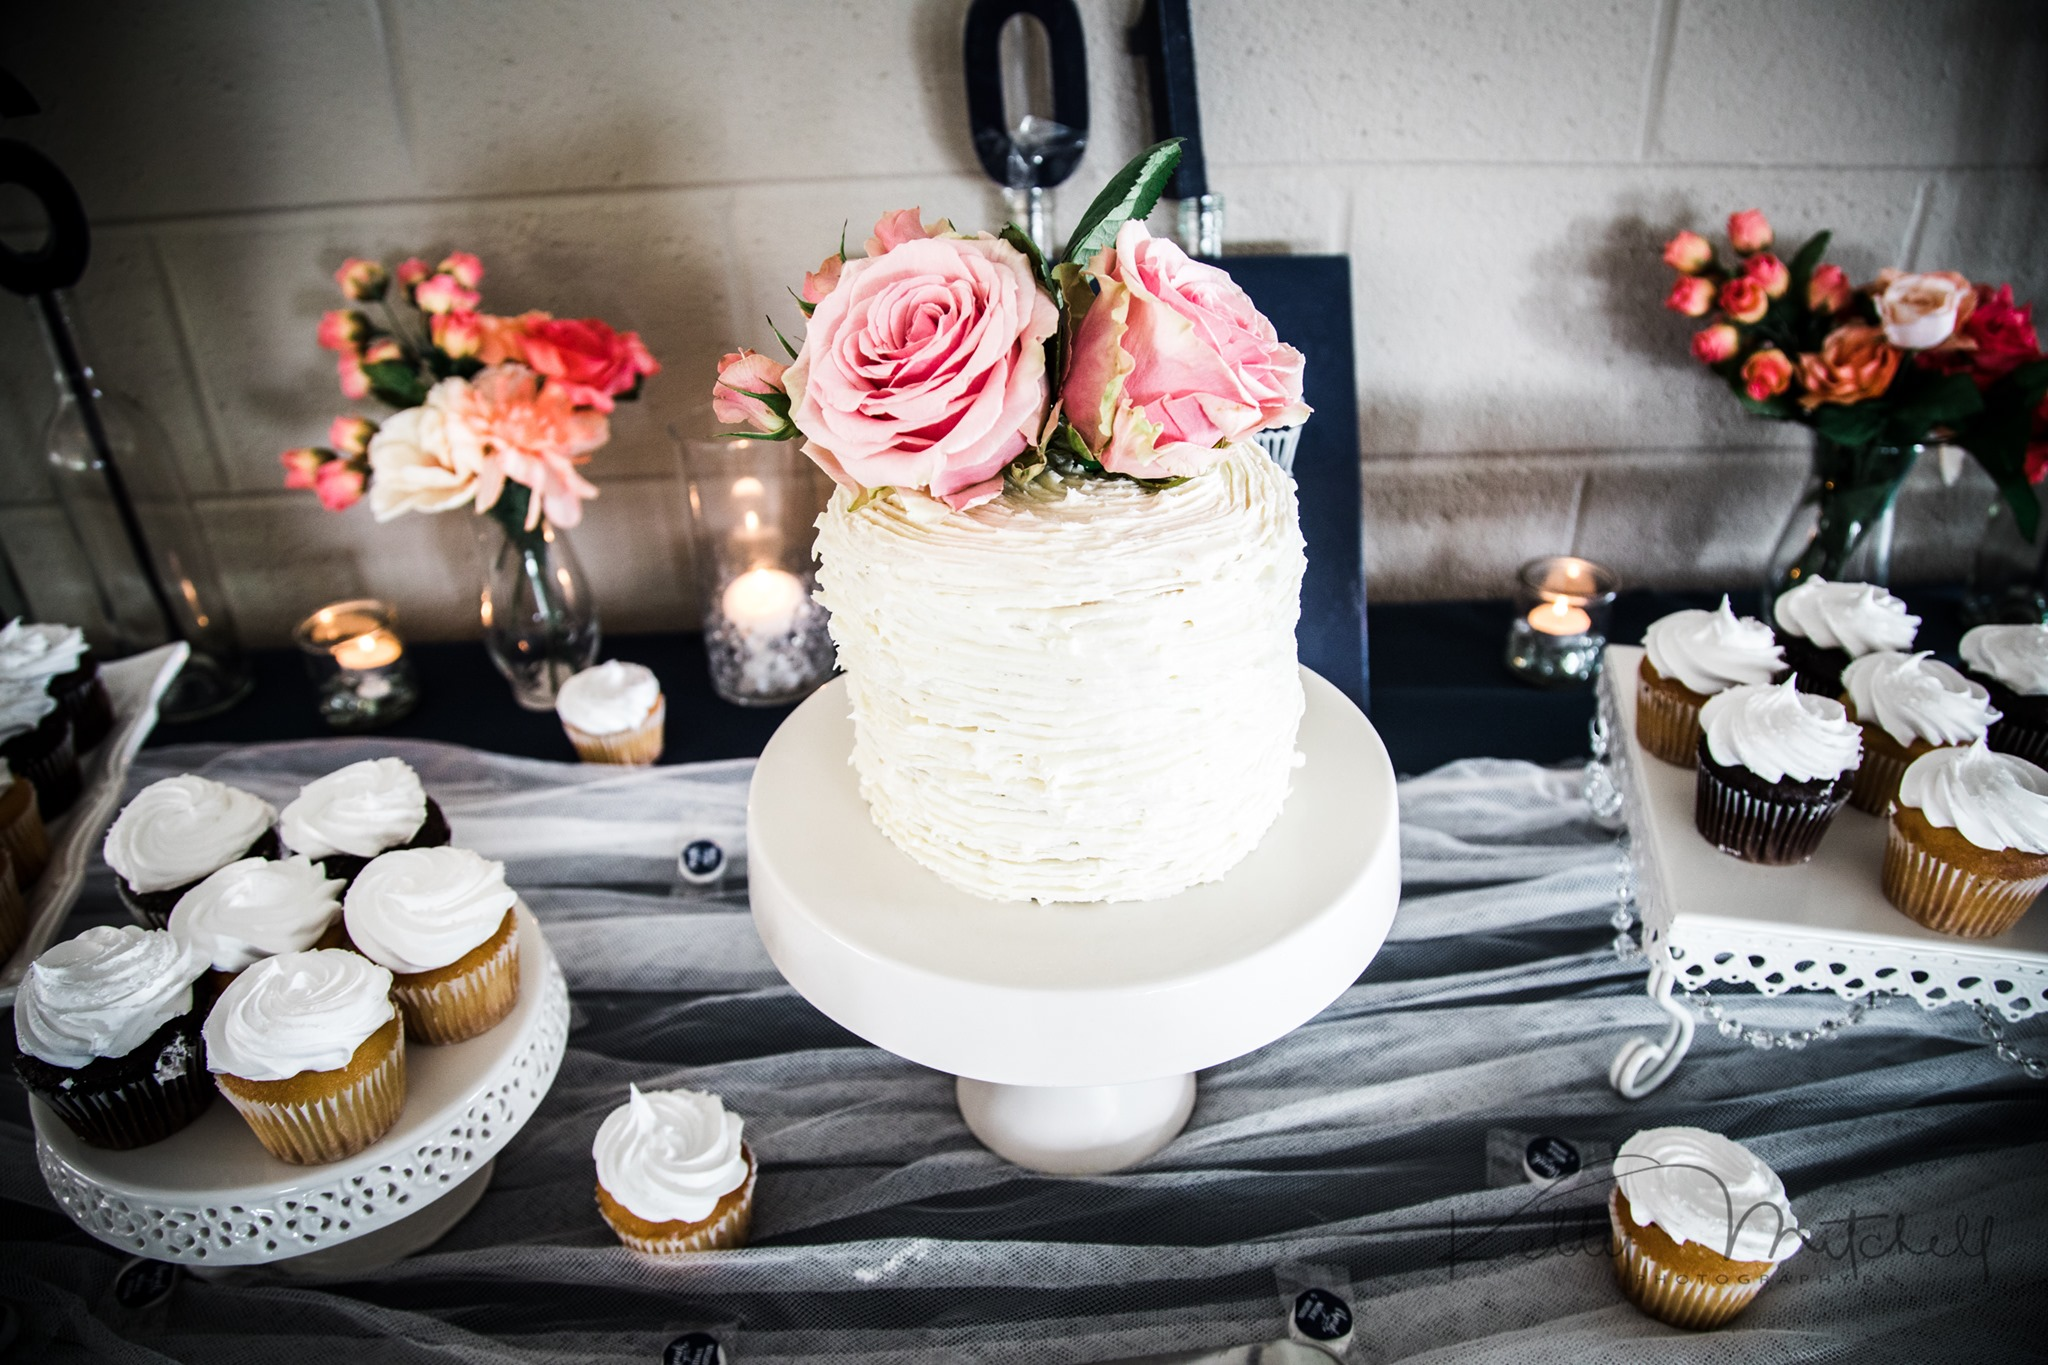 simple wedding cake, flower wedding cake, dessert table, maryland wedding cake, mother of the groom